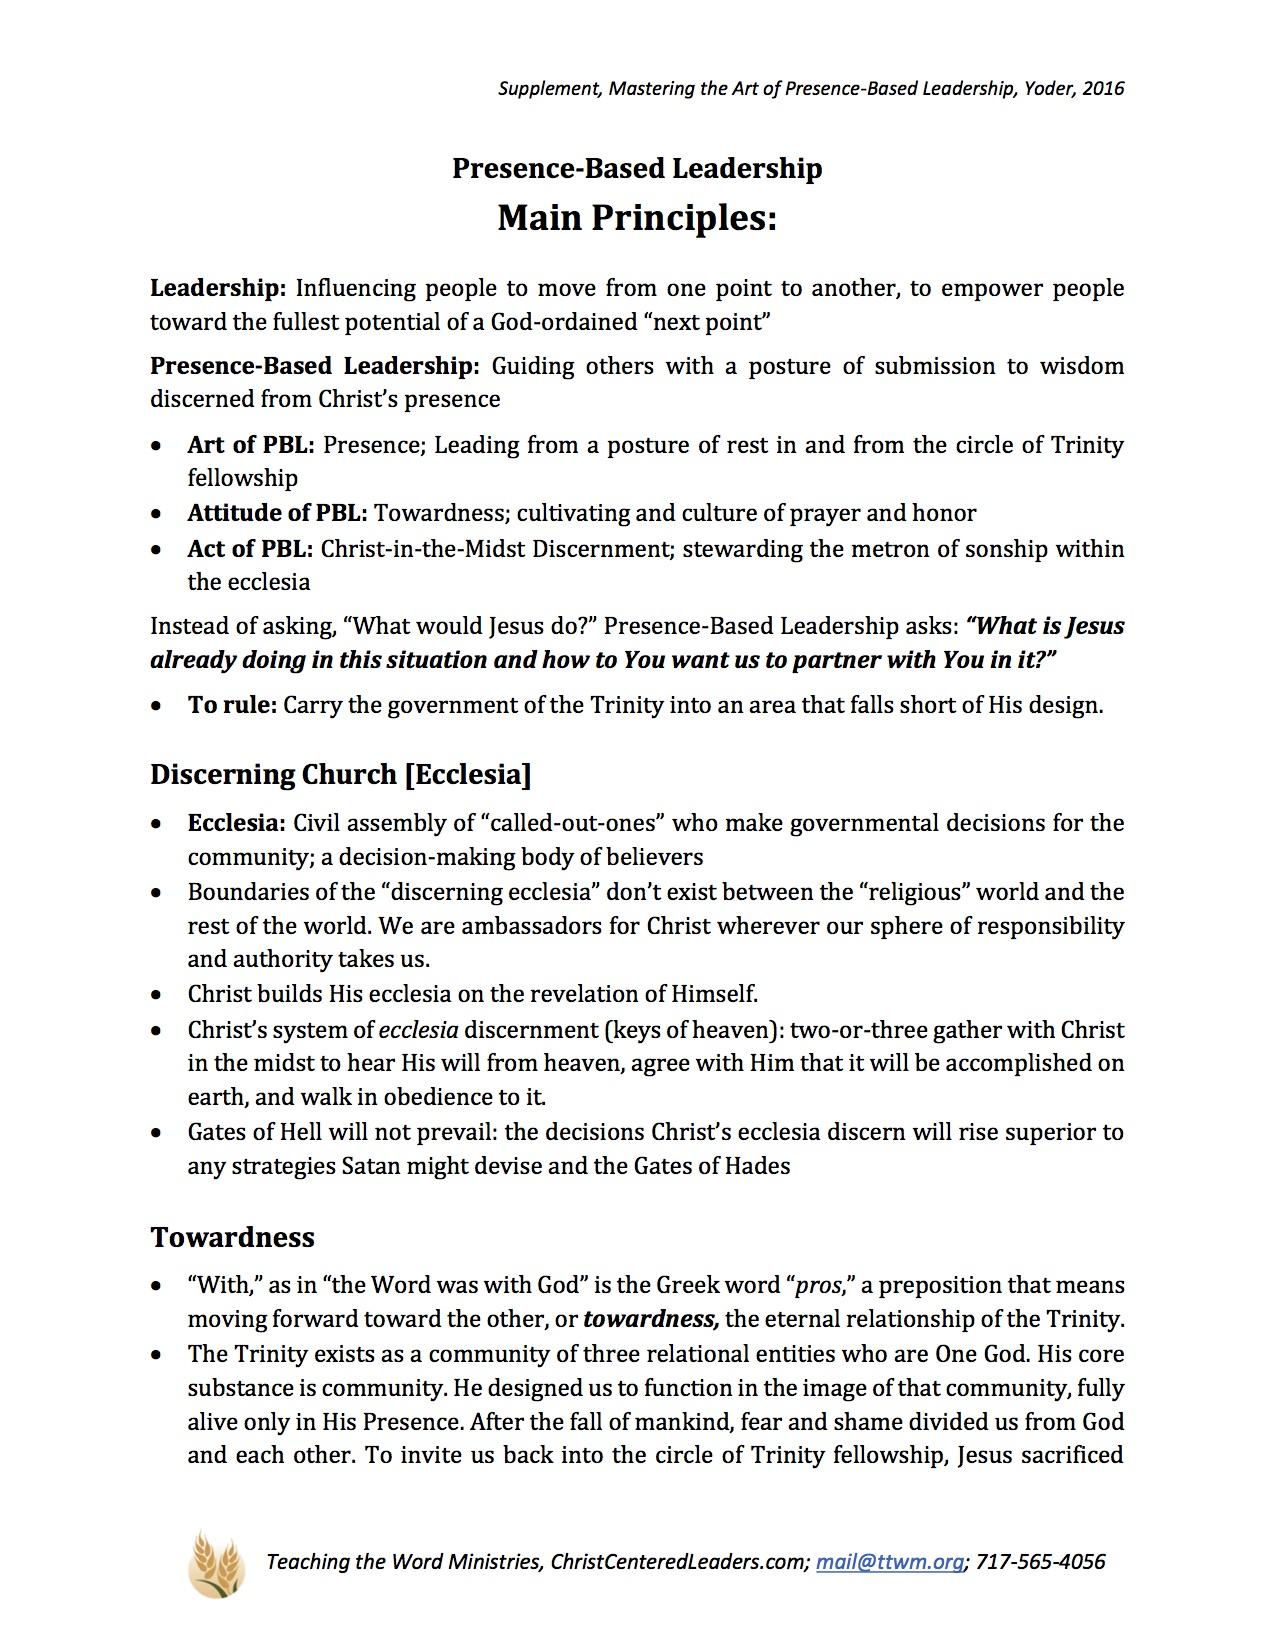 Outline of Main Presence-Based Leadership Principles